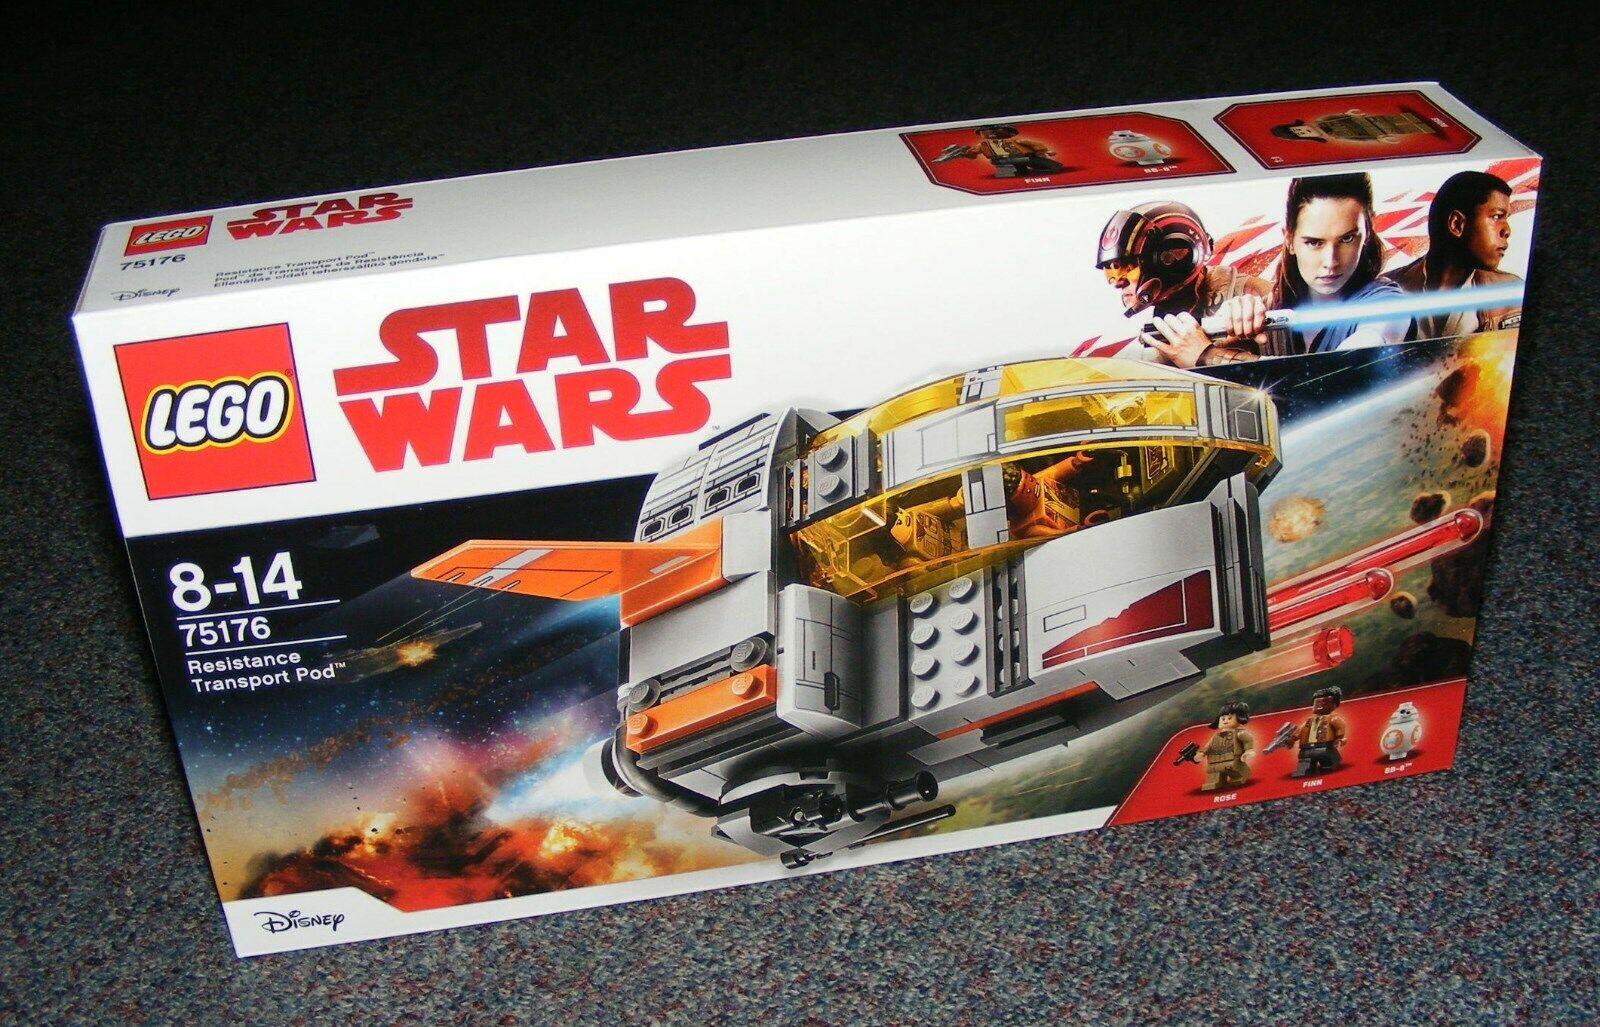 STAR WARS LEGO 75176 RESISTANCE TRANSPORT POD BRAND NEW SEALED